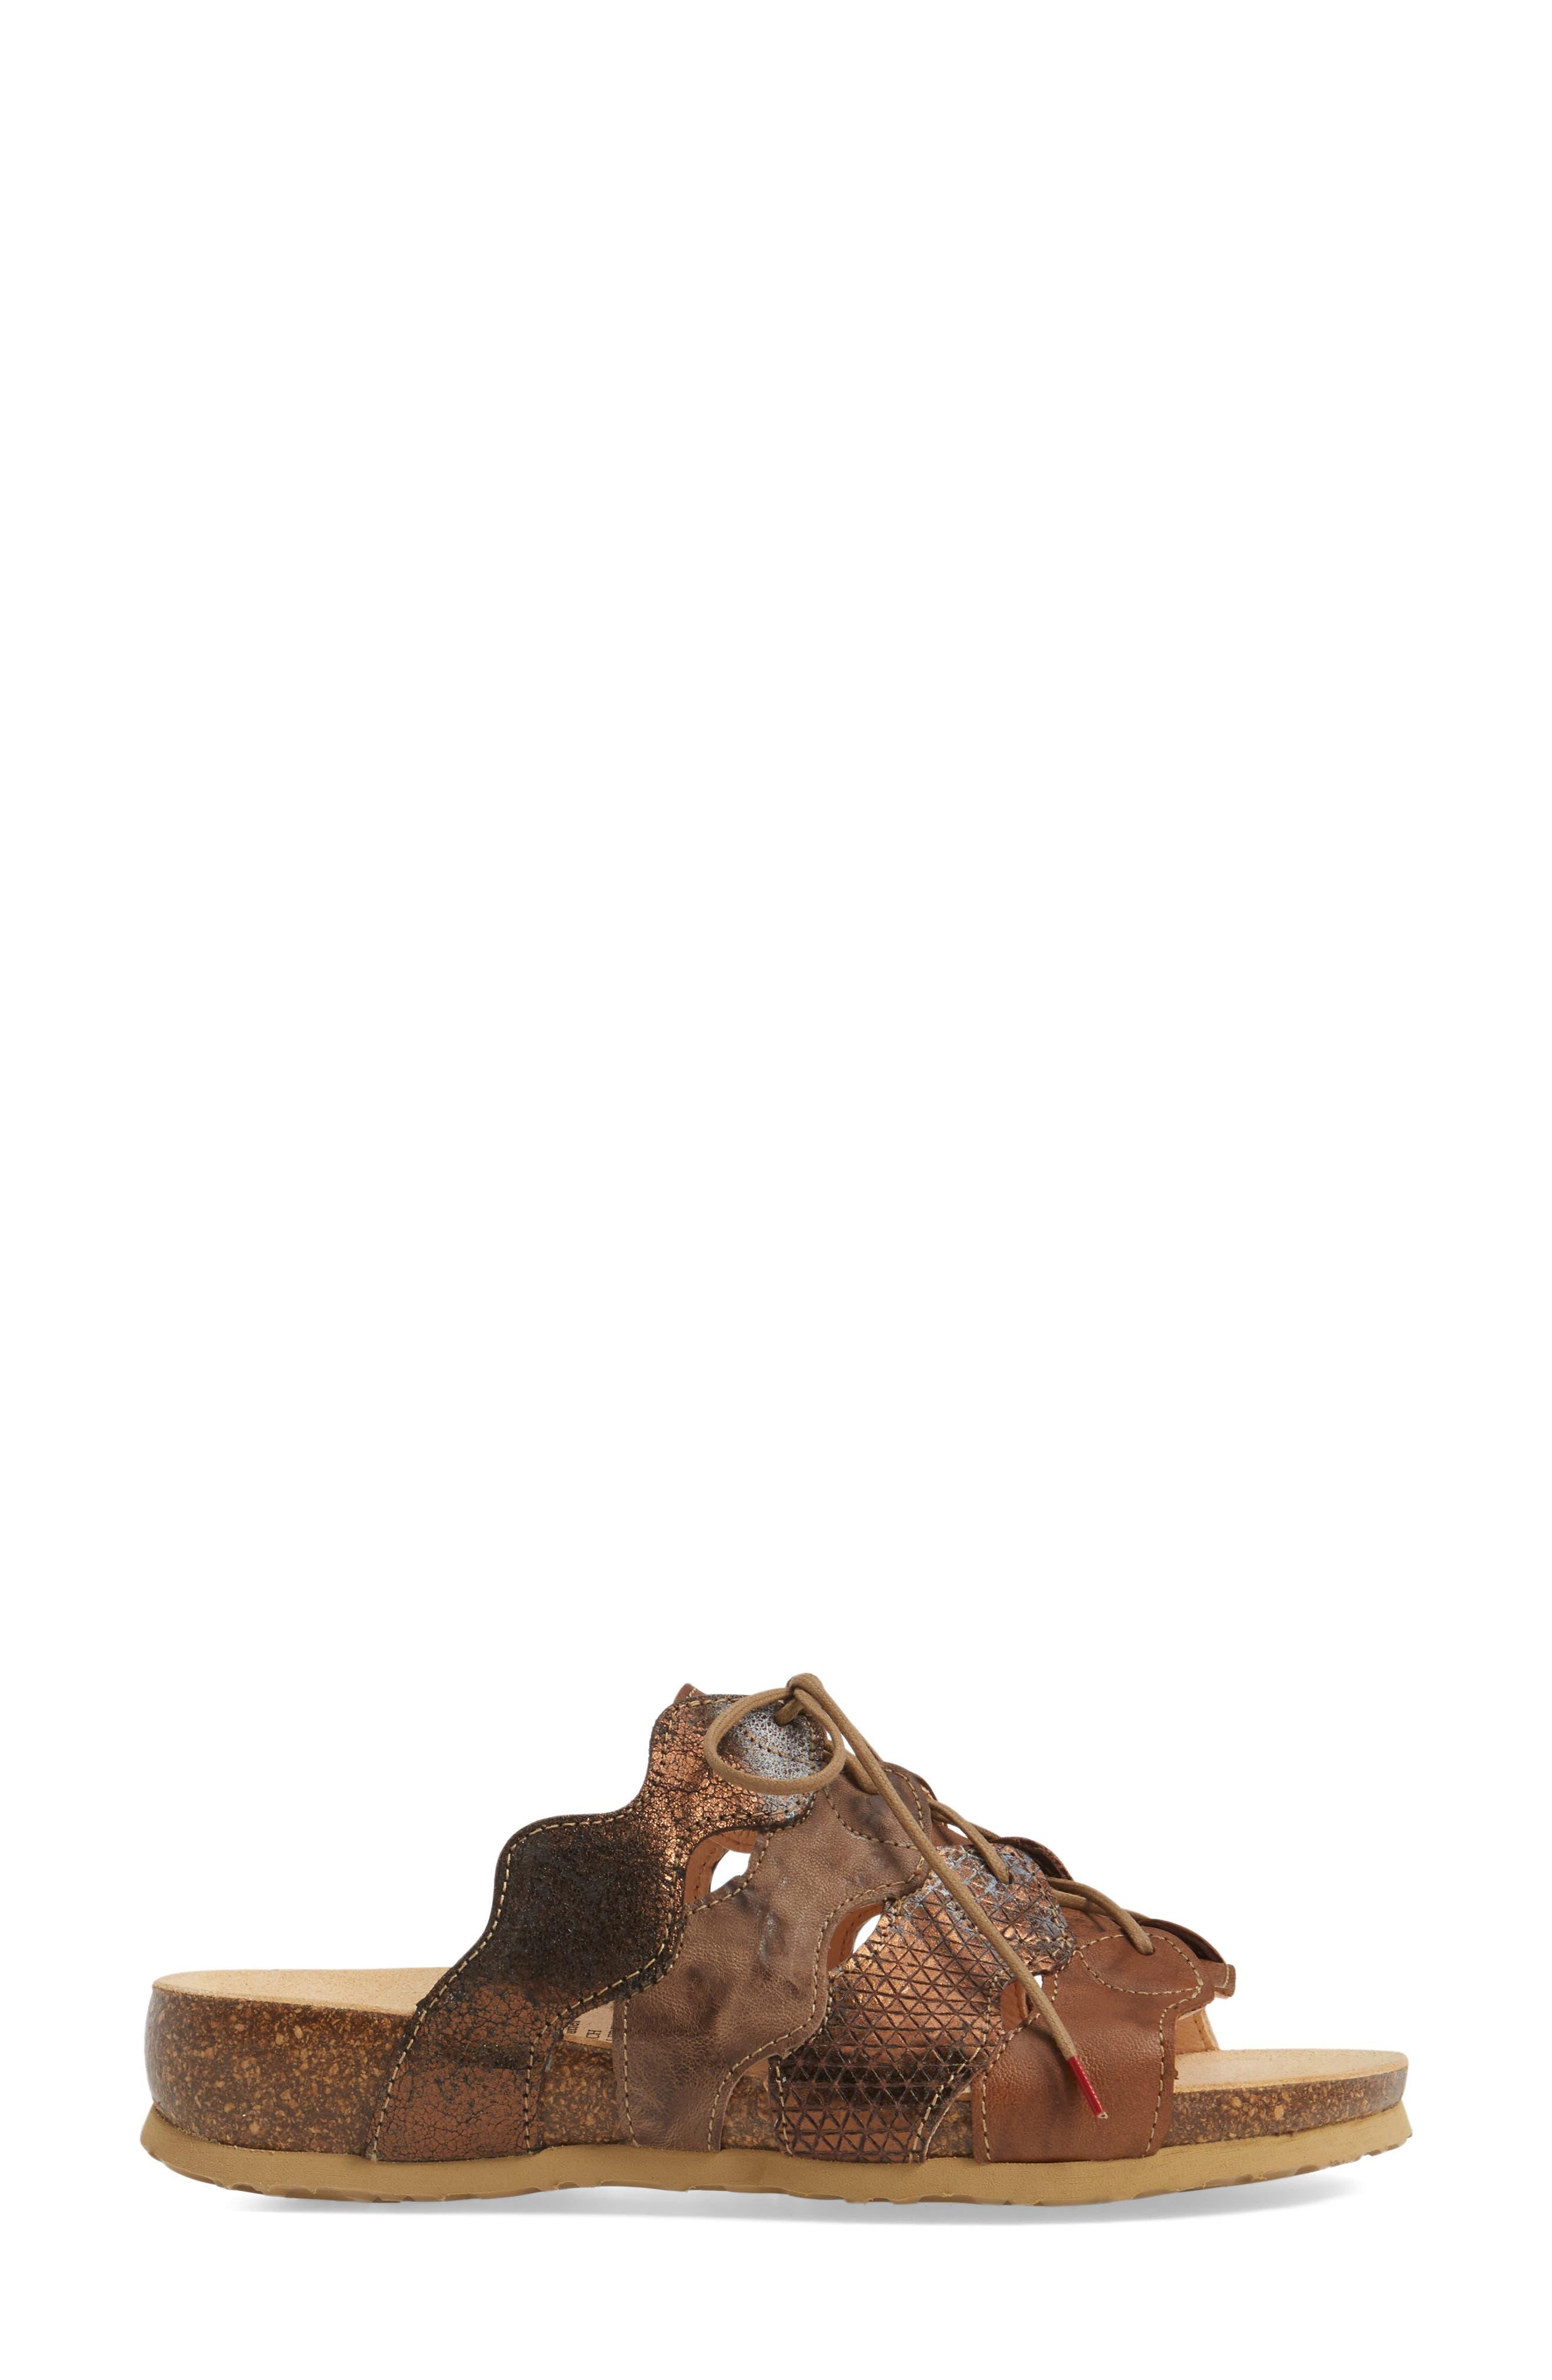 Julia Sandal,                             Alternate thumbnail 3, color,                             Lion Brown Leather